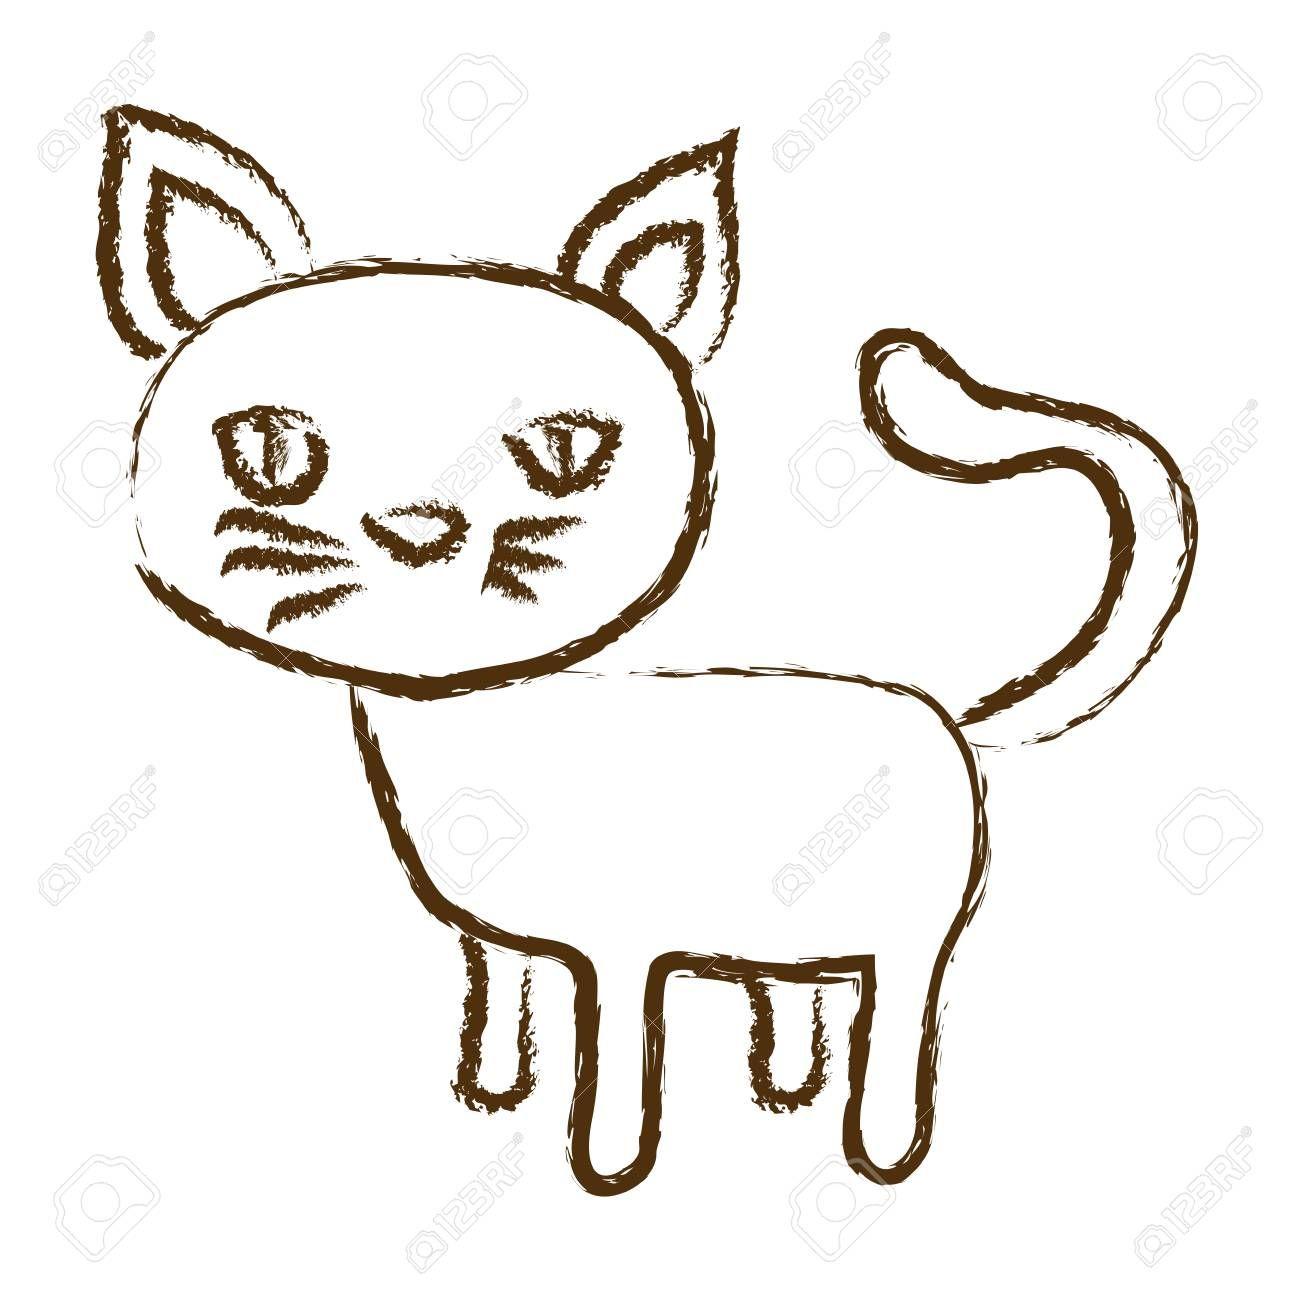 Monochrome Hand Drawn Silhouette Of Cat Vector Illustration